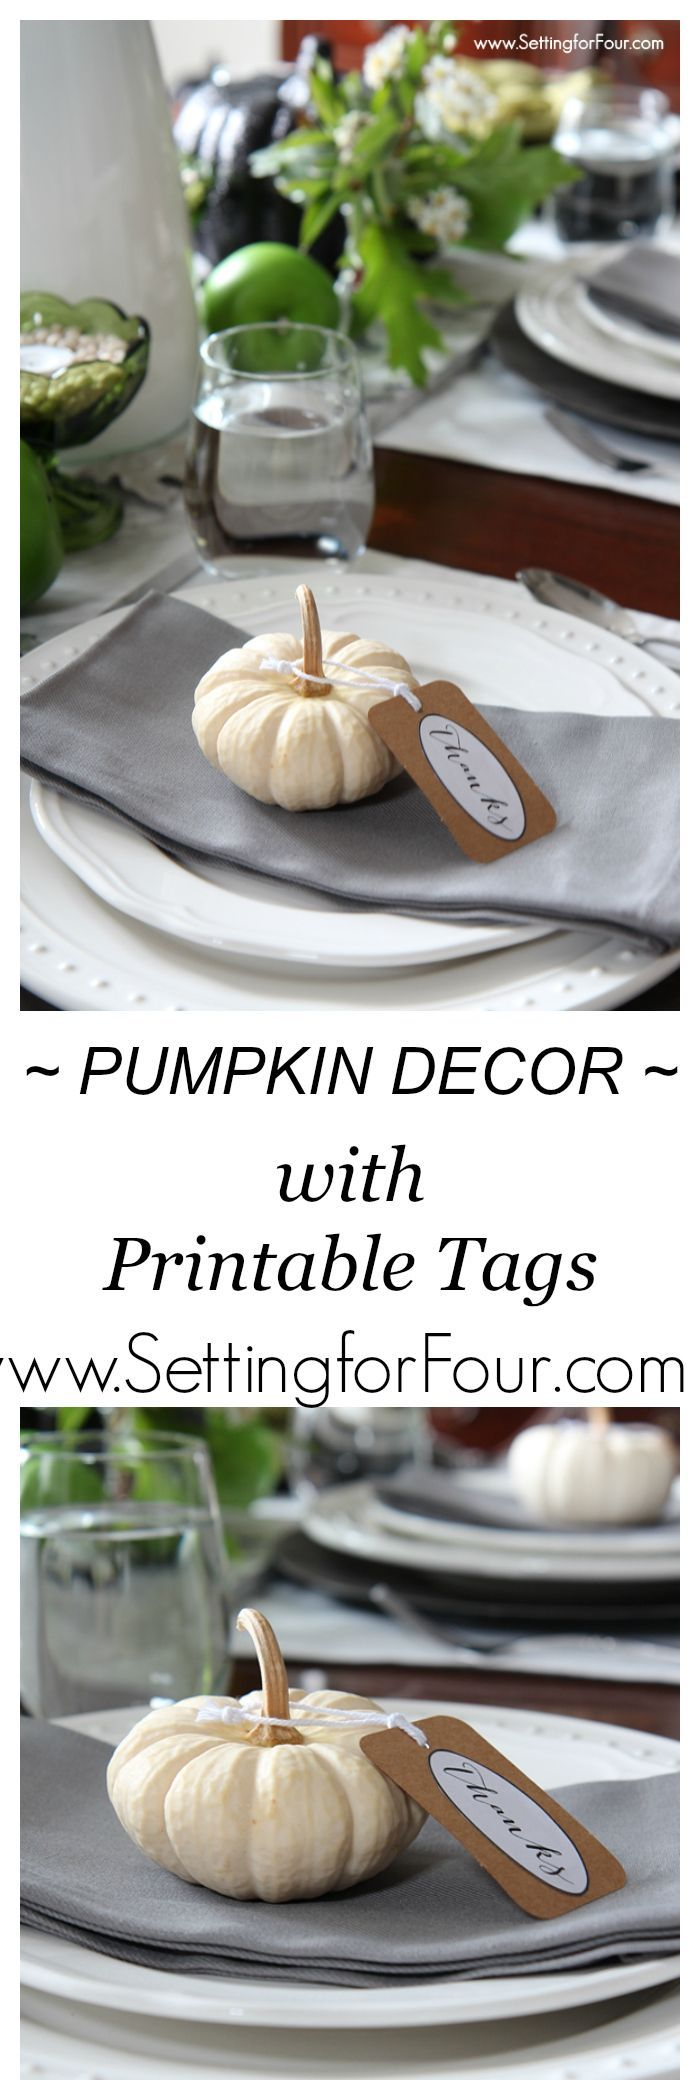 Easy Pumpkin Decor with Printable Tags 208